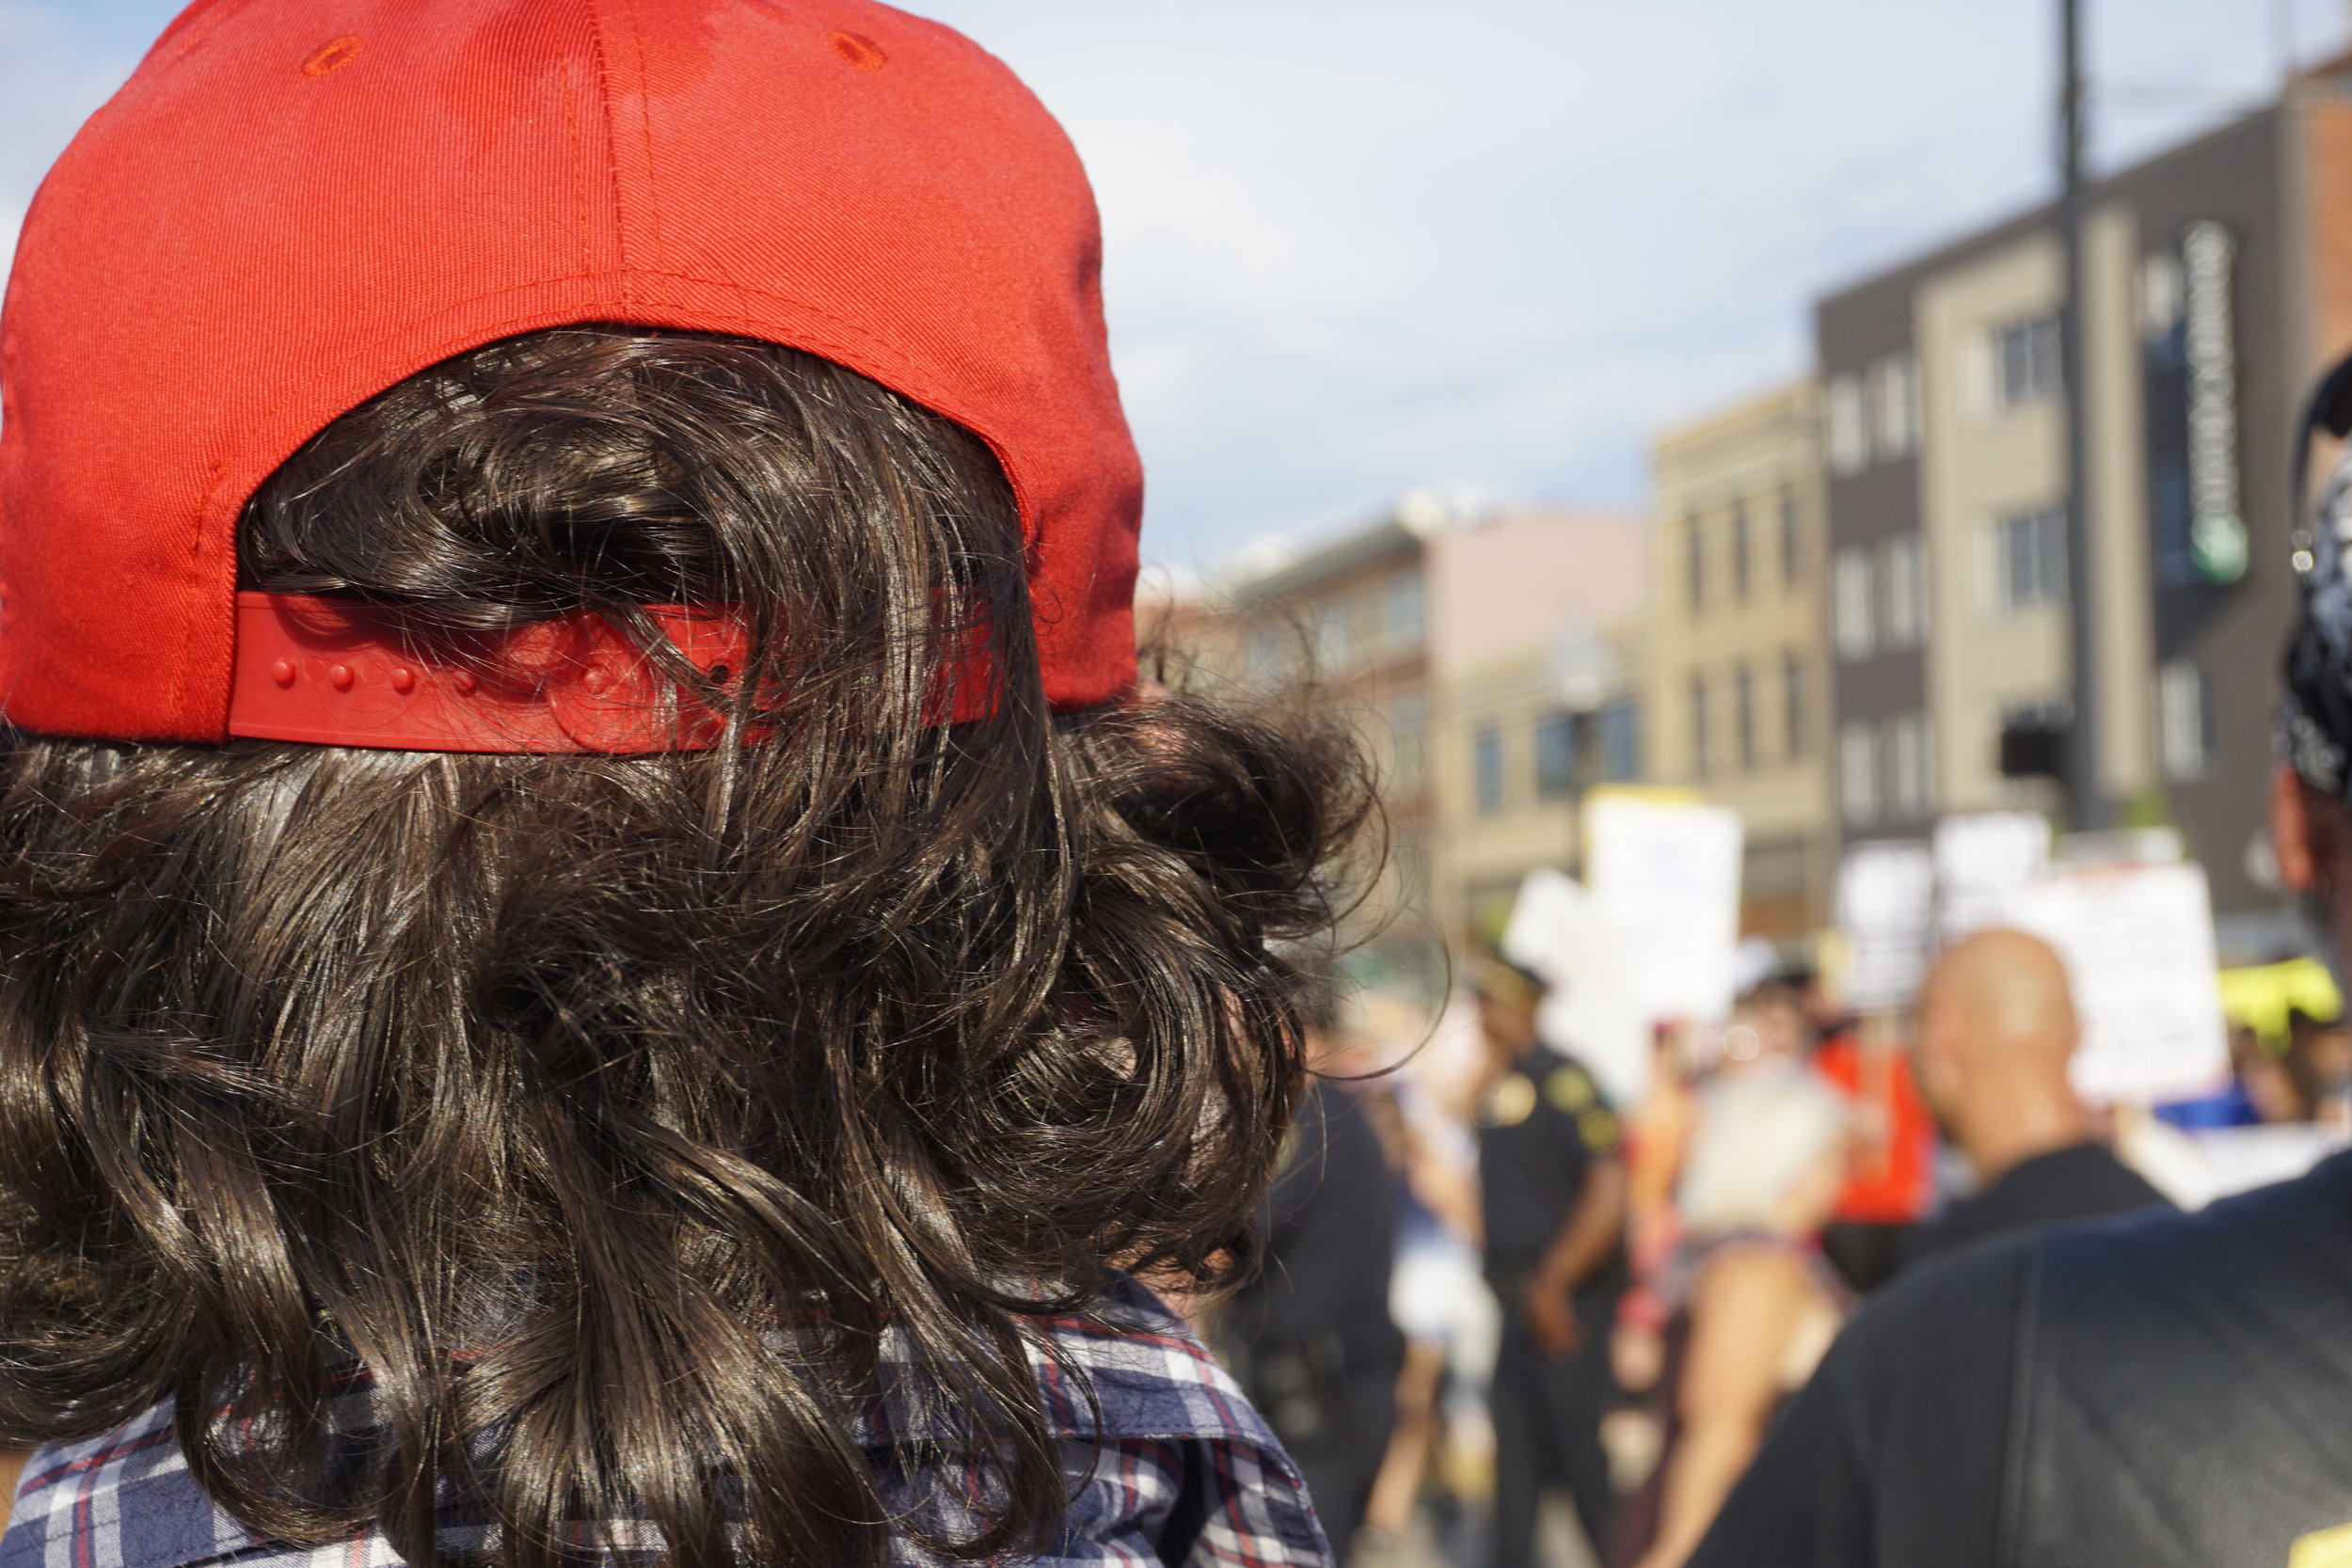 trump hat close up.JPG